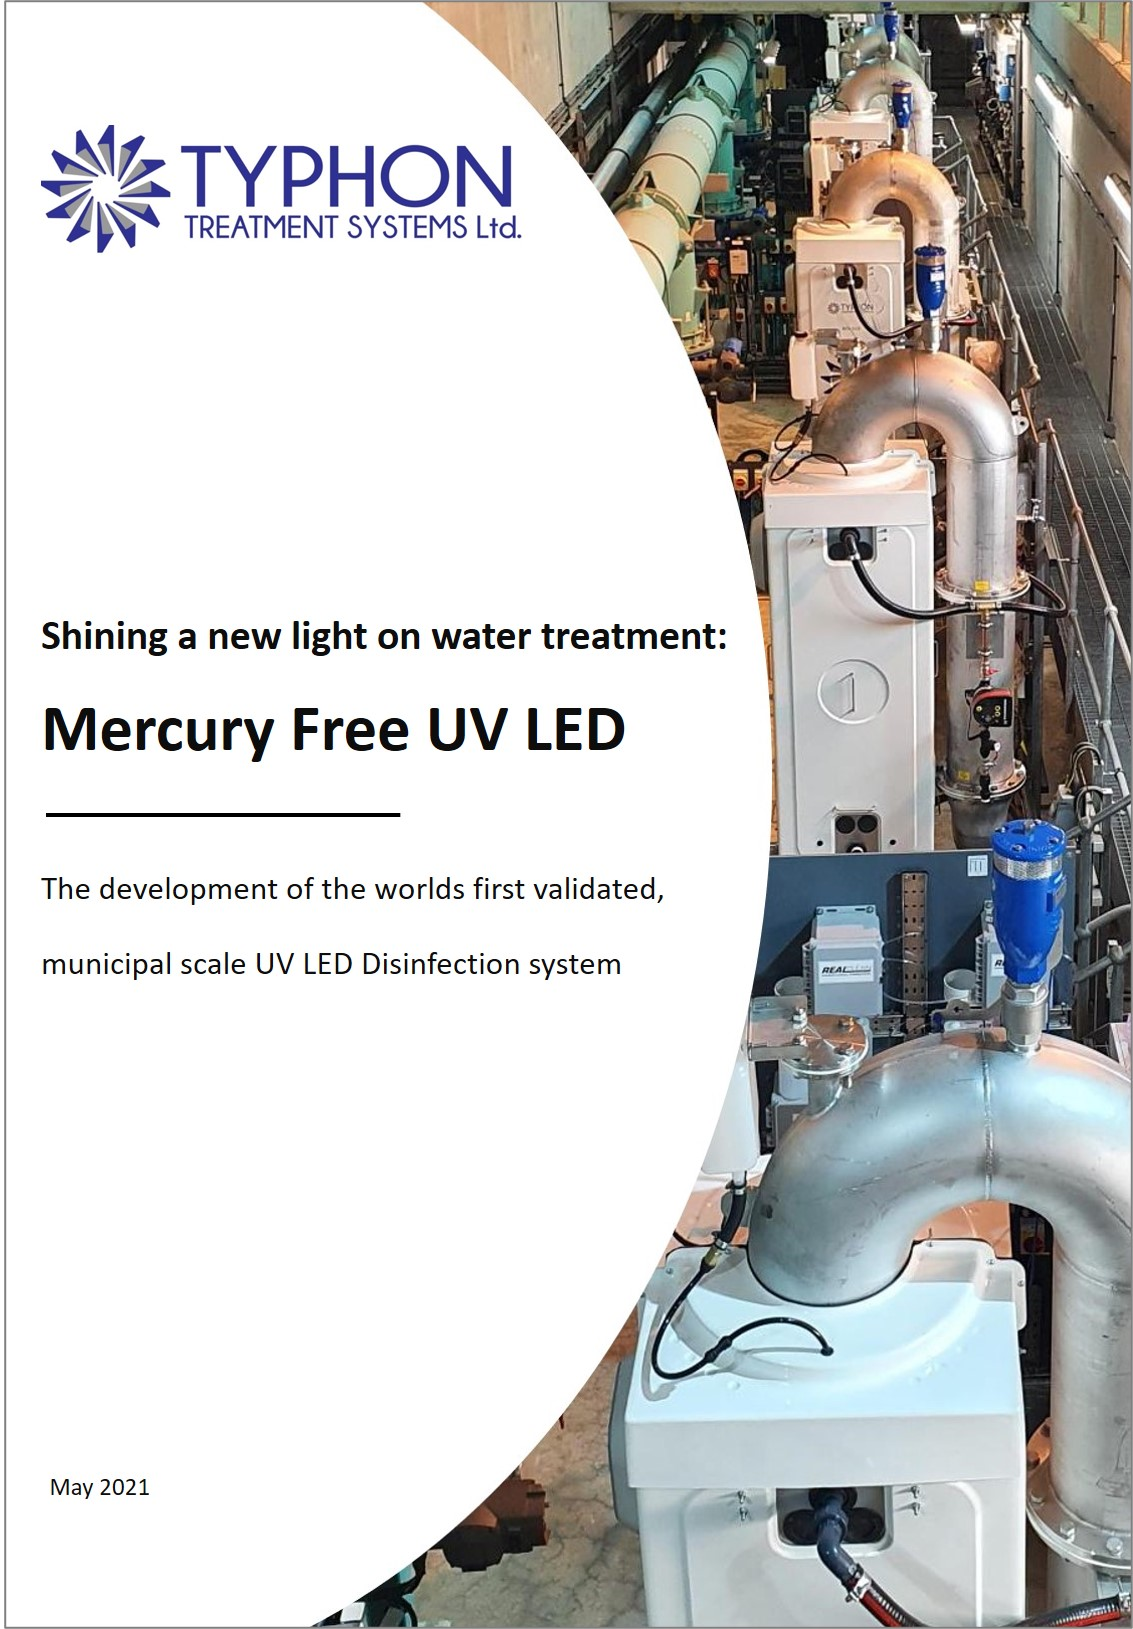 UV LED Disinfection White Paper publication